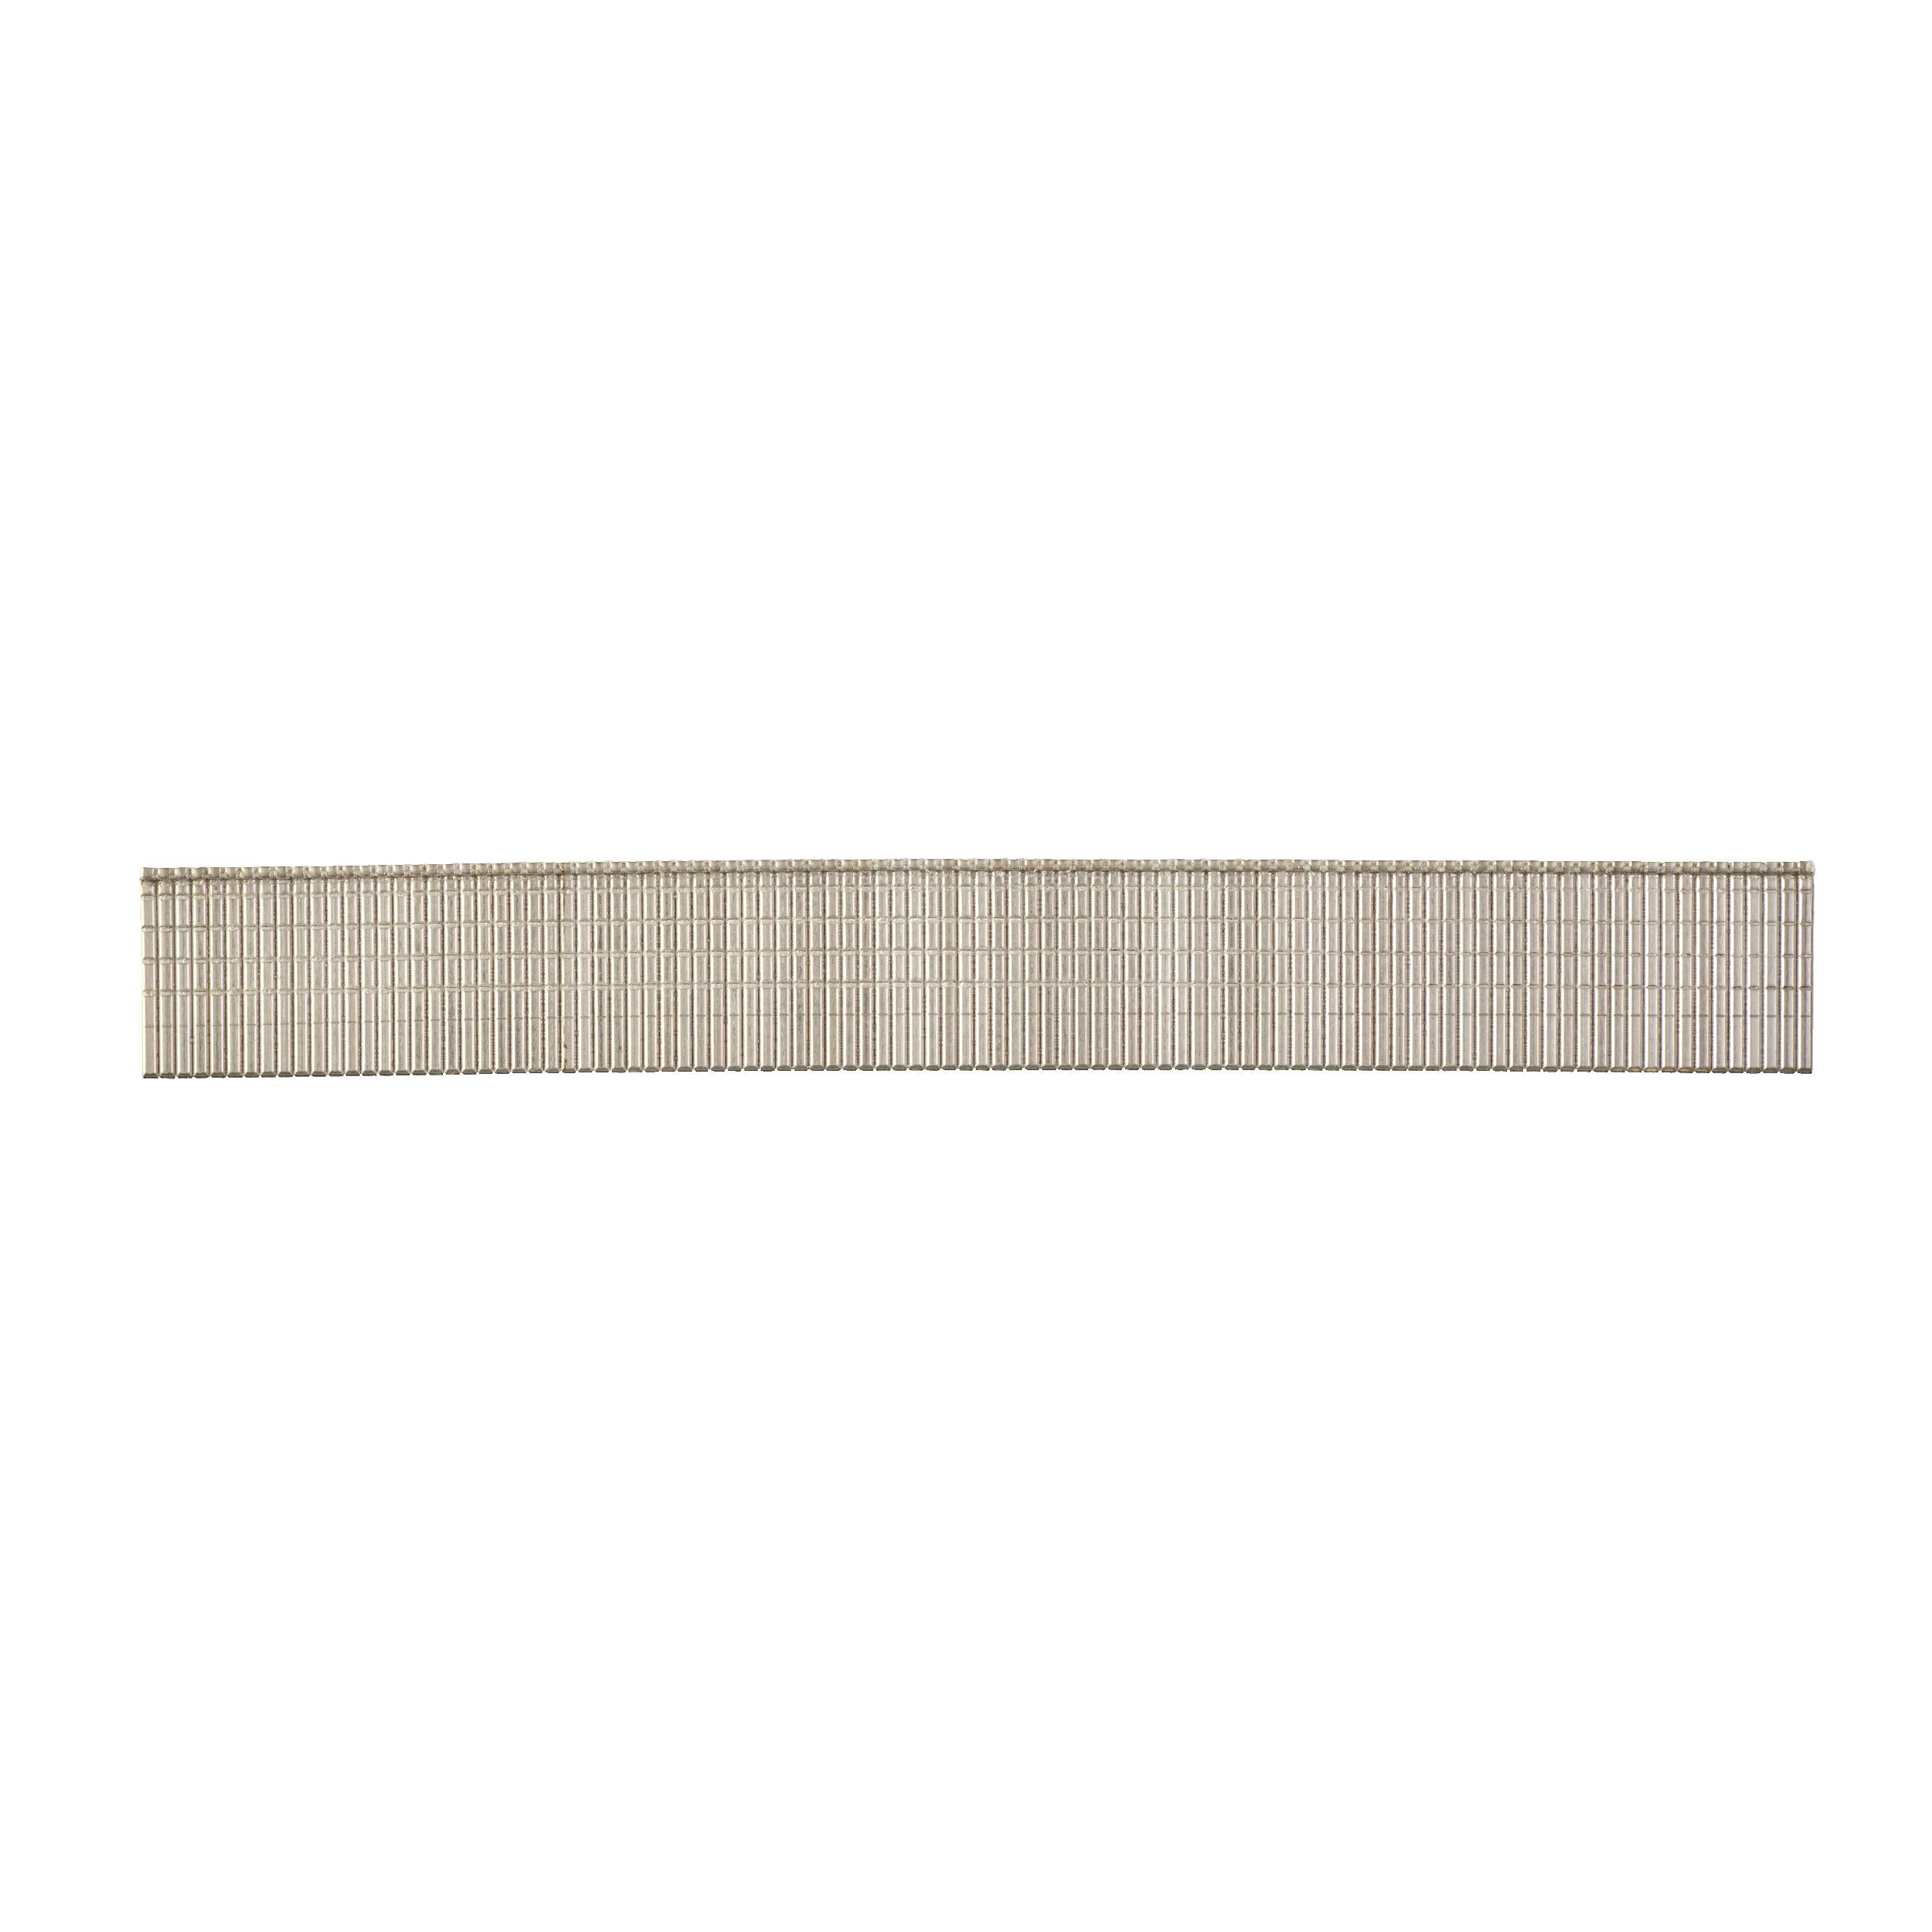 Hřebíky Inox 18G/16mm-10 tisíc ks